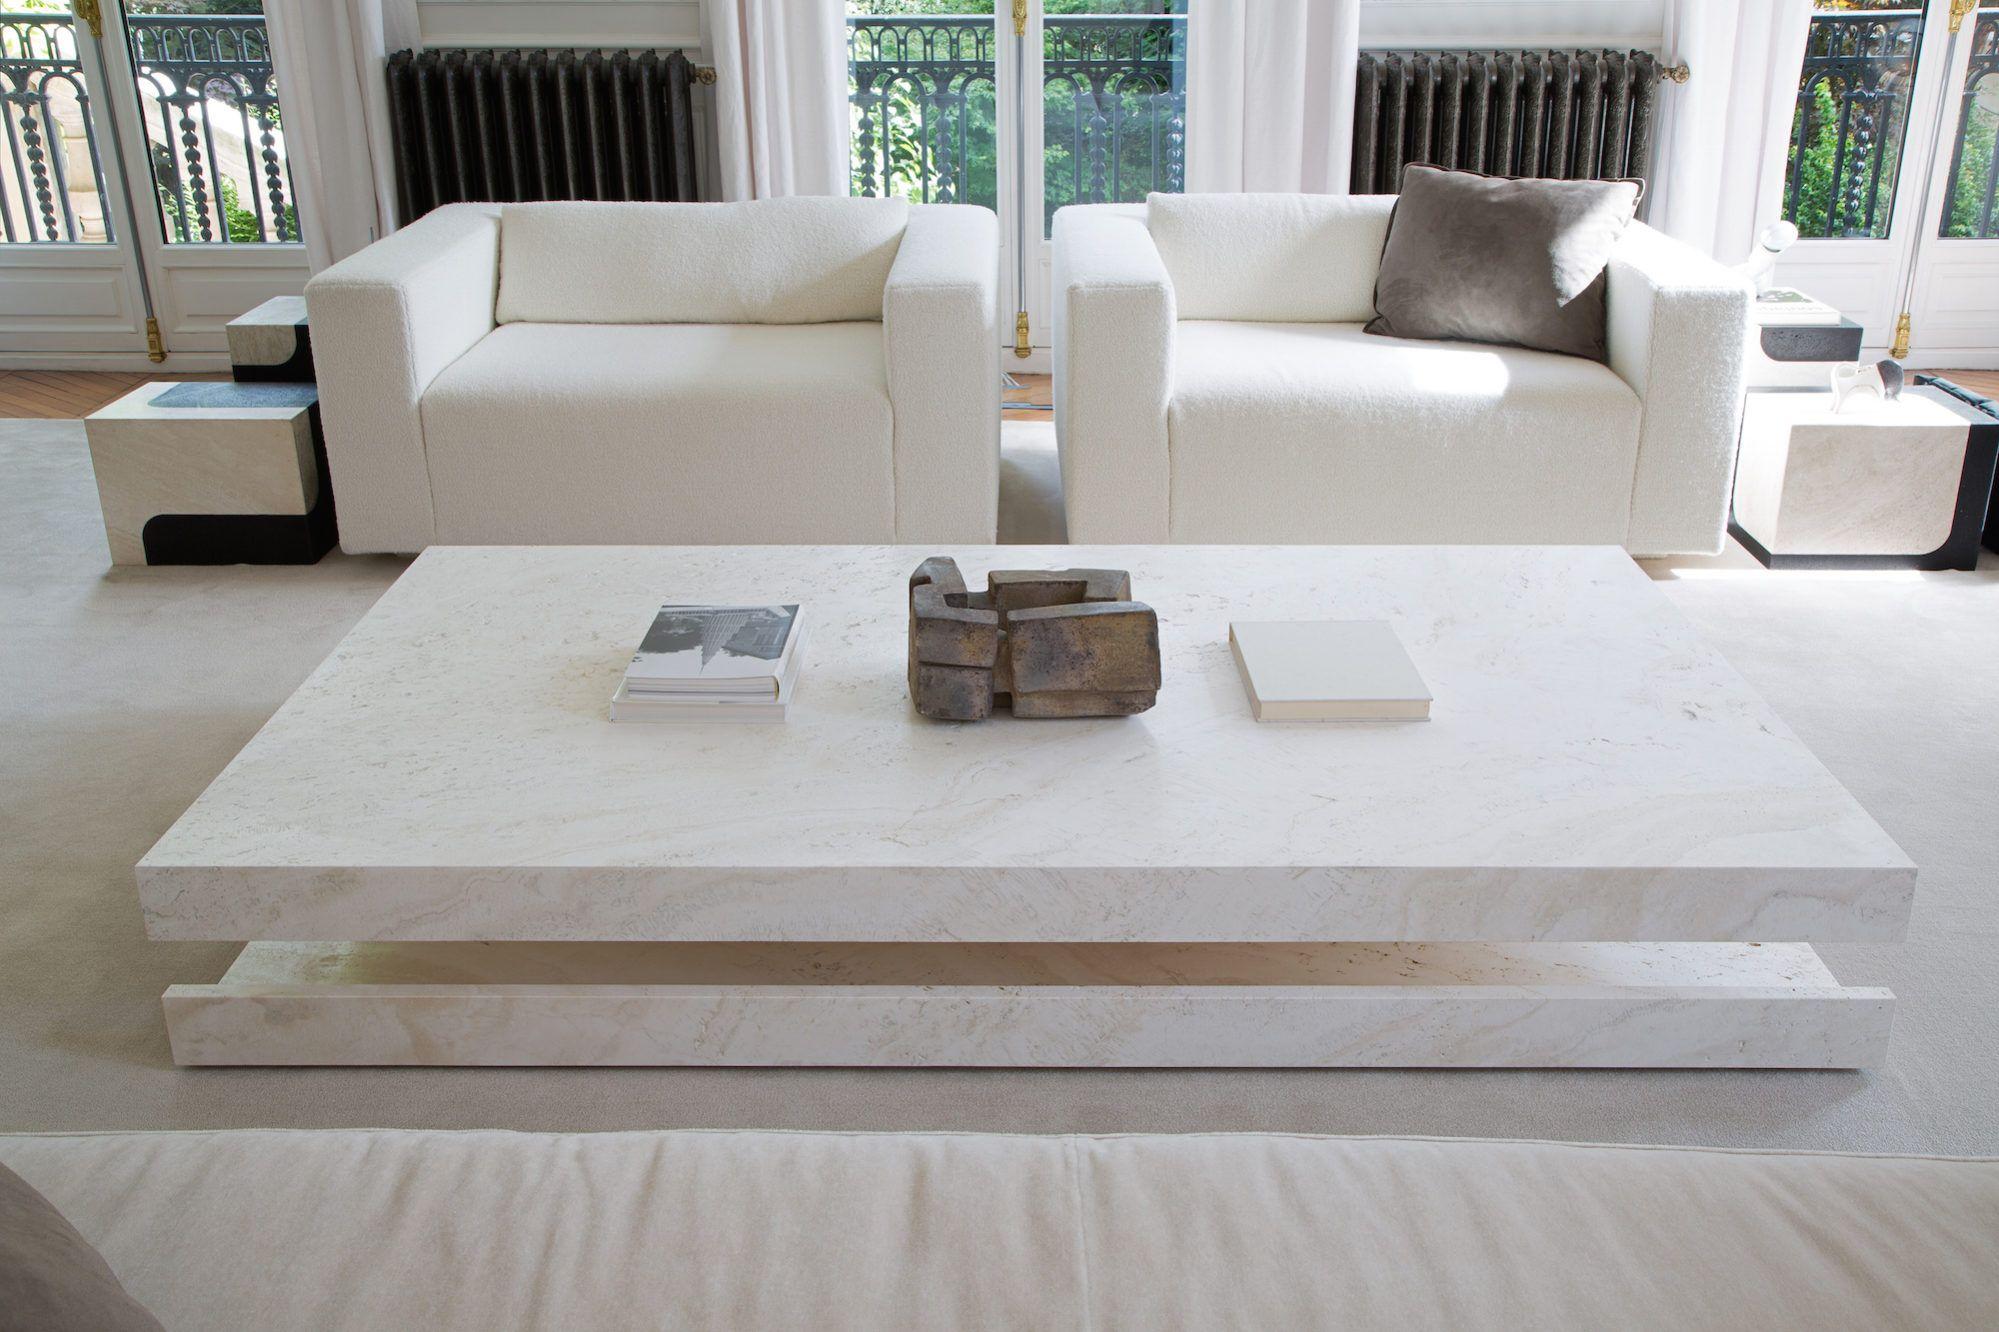 I Love This Coffee Table By Stephaneparmentier Shown By Studiotwentyseven A Modern Ev Coffee Table Japanese Interior Design Japanese Interior Design Modern [ 1332 x 1999 Pixel ]